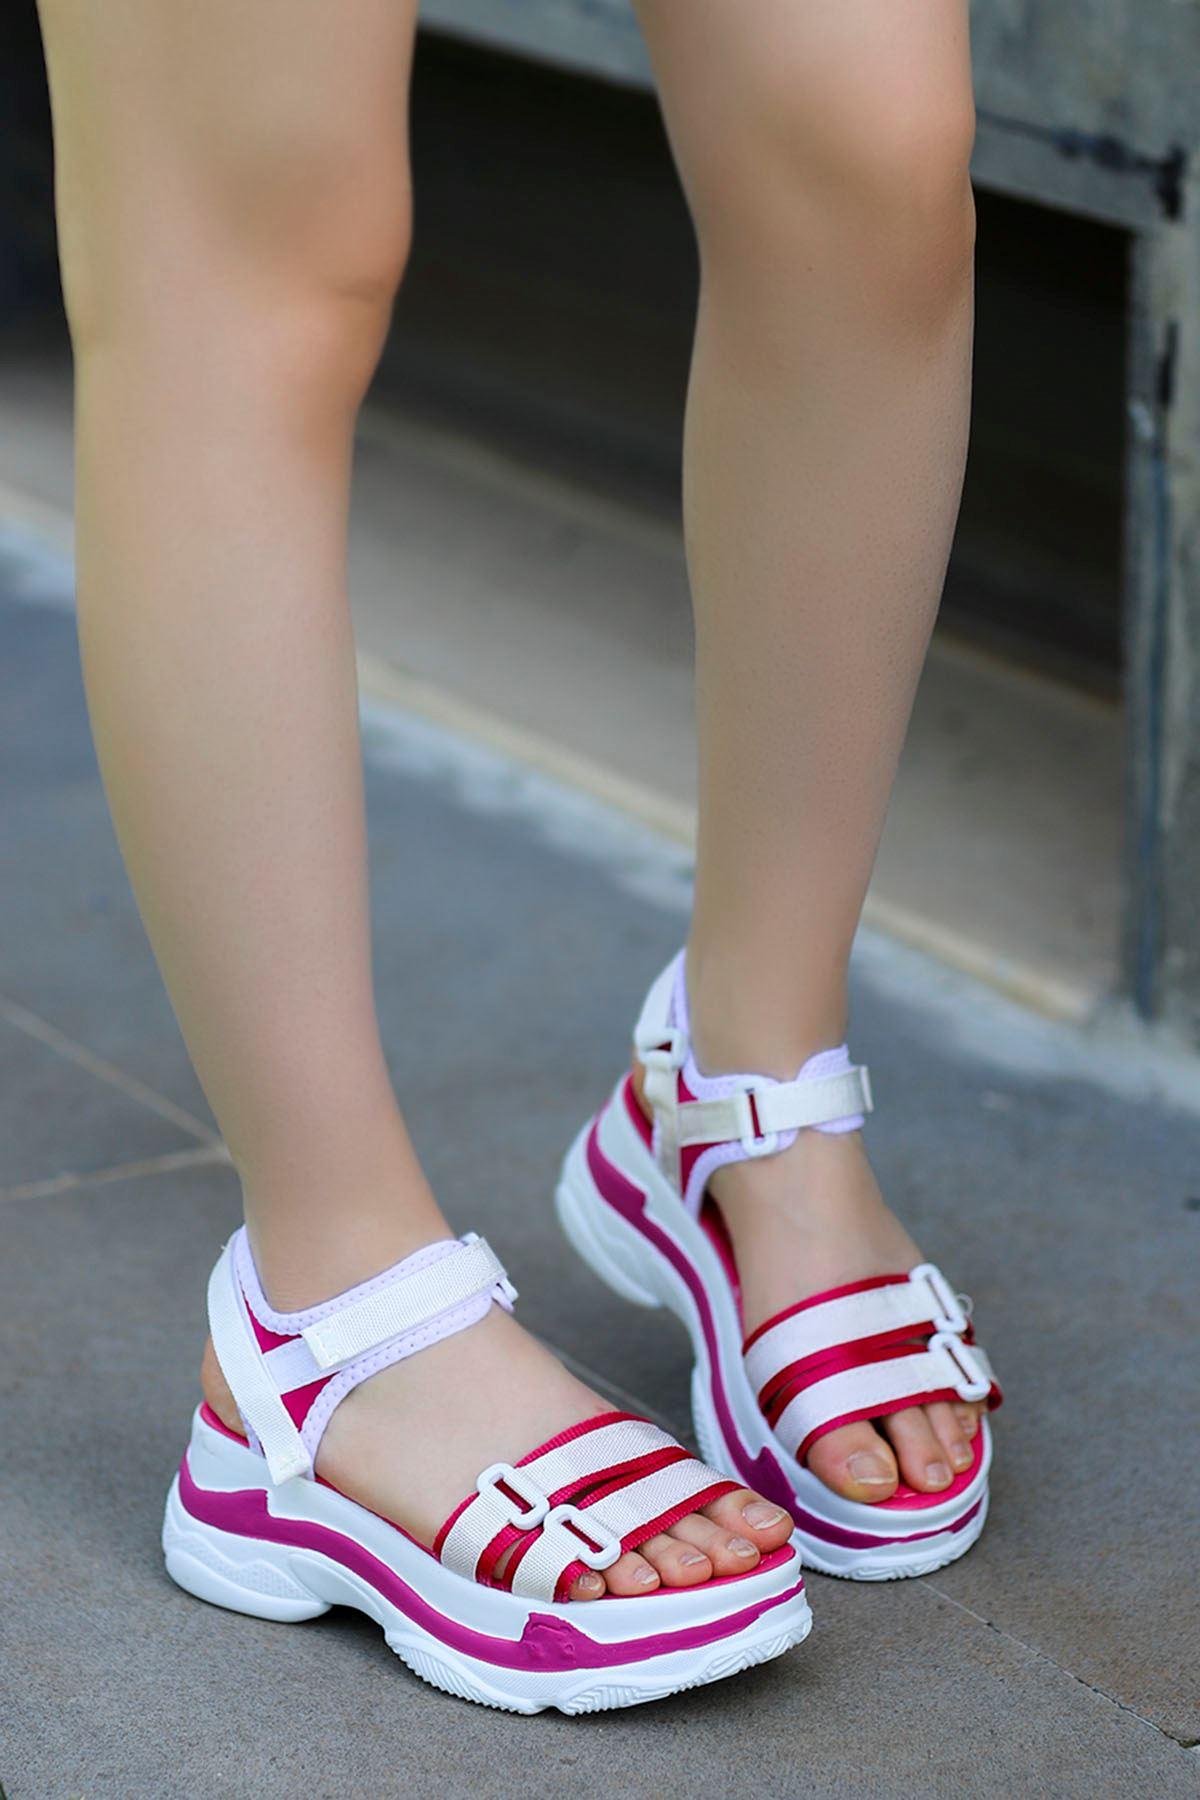 Hooly Dolgu Taban Sandalet Fuşya-Beyaz